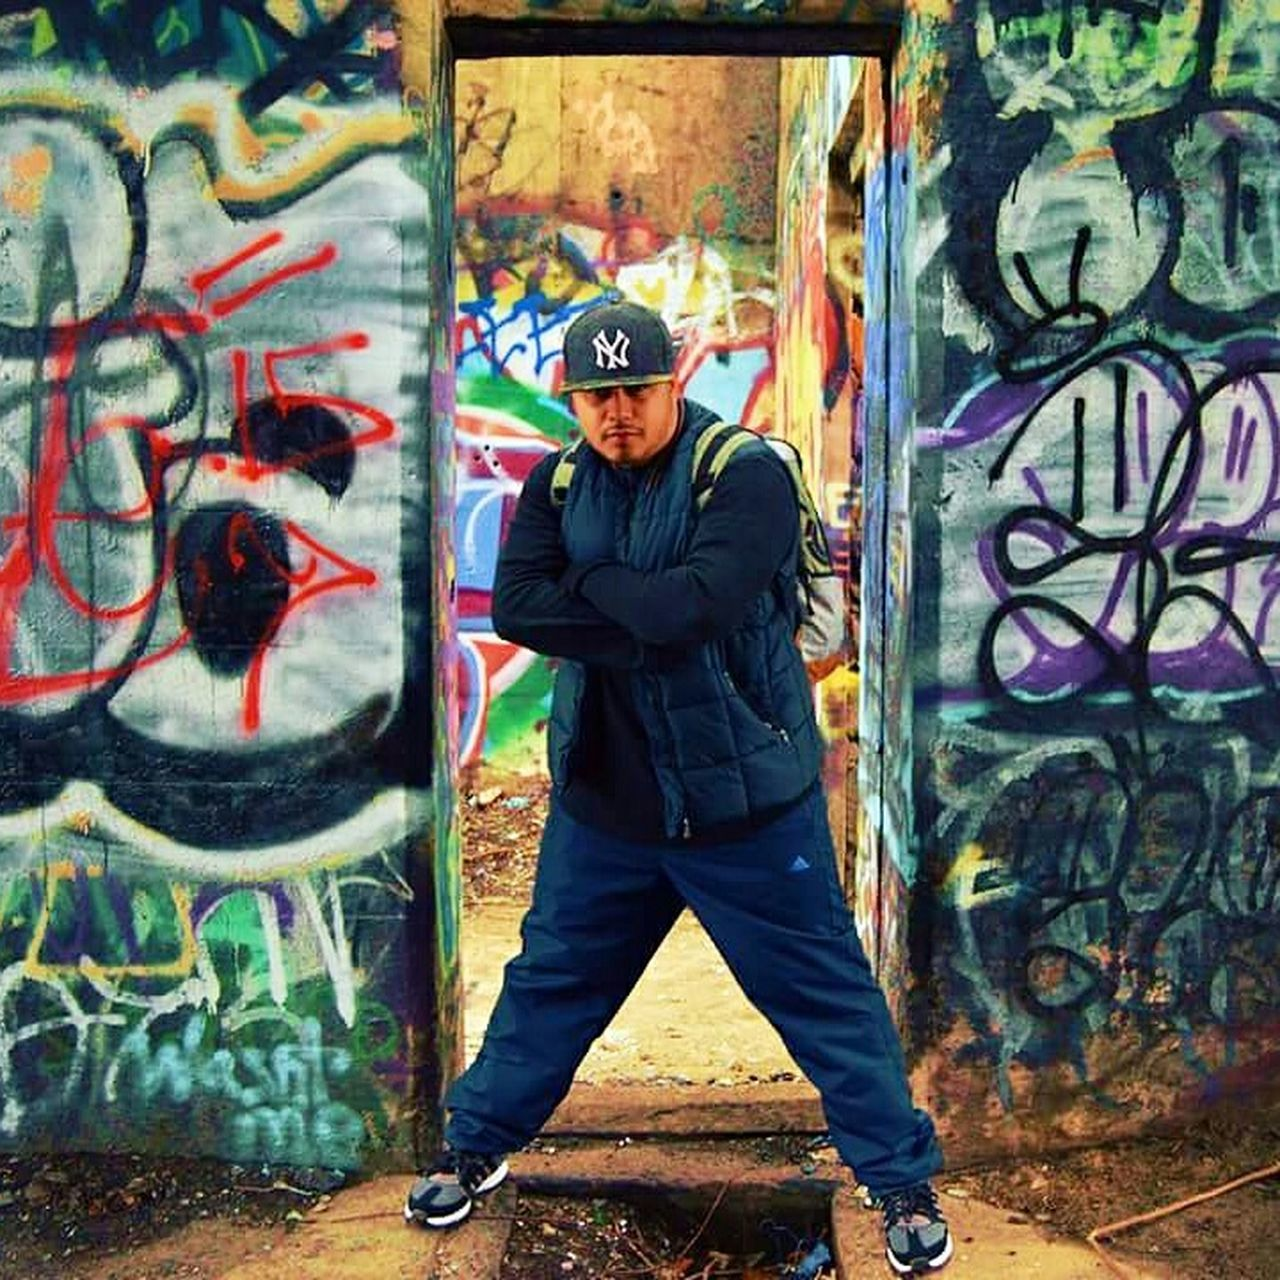 The Traveler - 2015 EyeEm Awards Urban Photography Graffiti Pier Graffiti Abandoned Places Urban Art Get Lost Urban Exploration